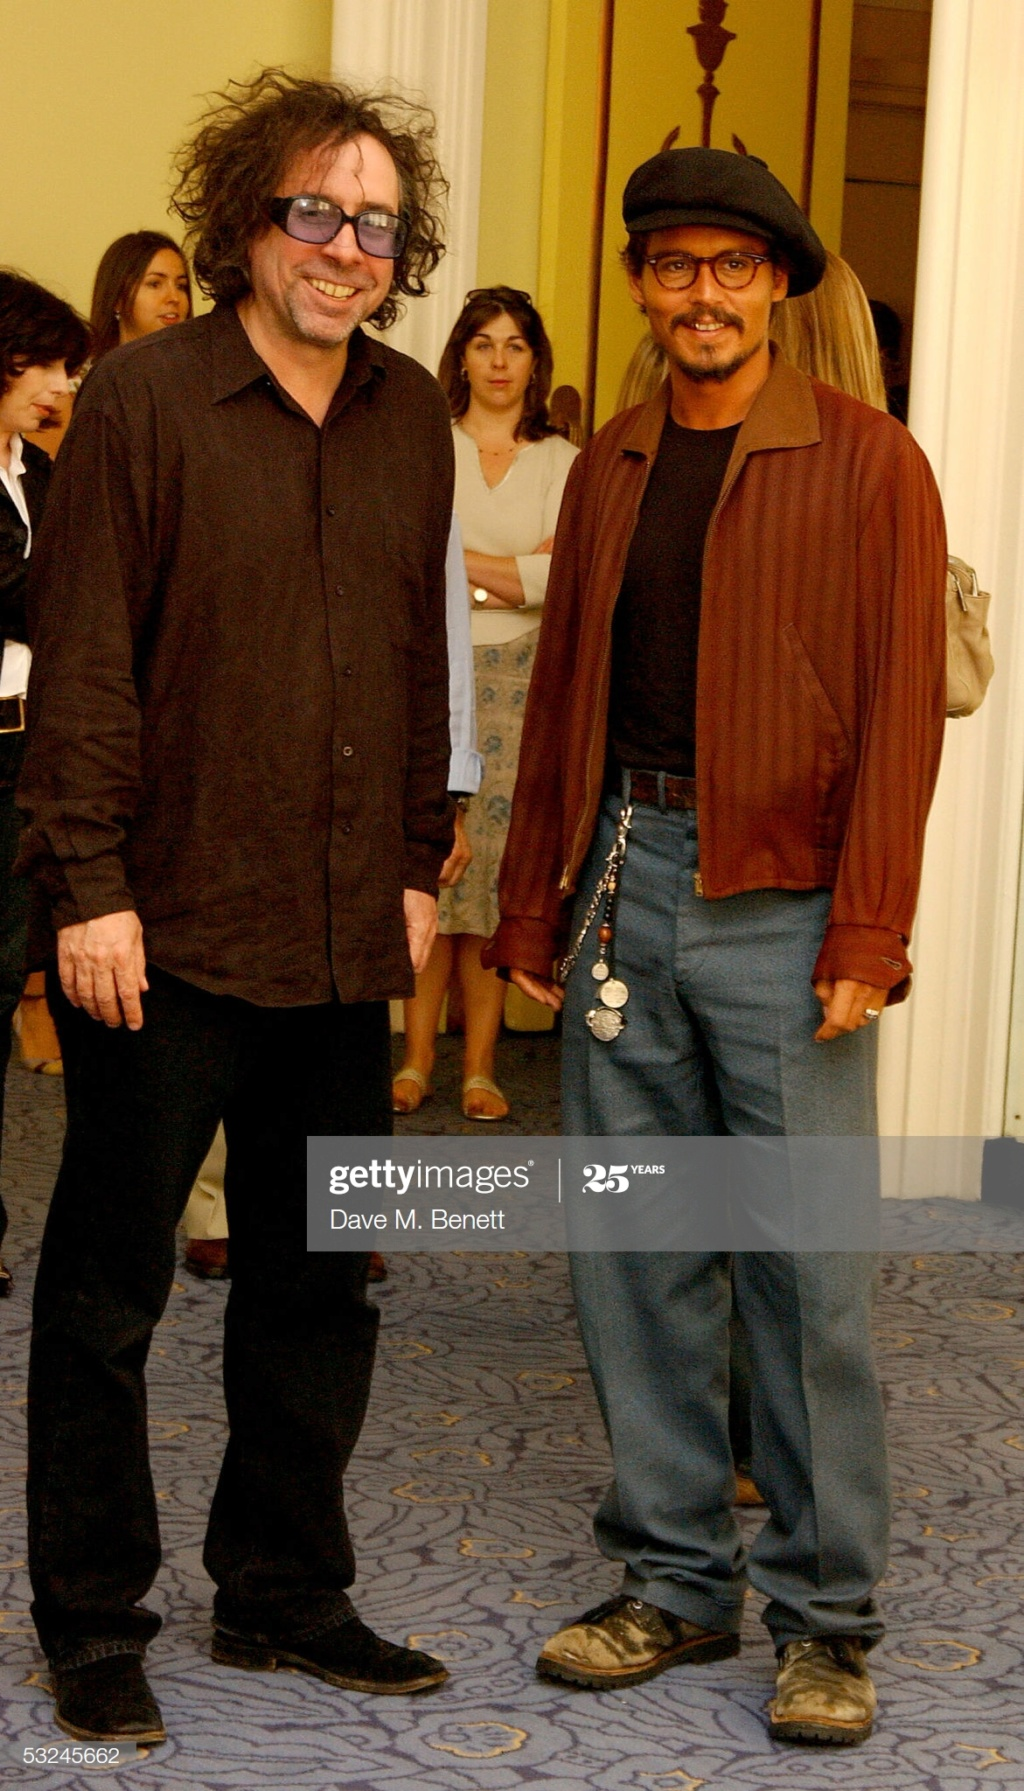 ¿Cuánto mide Johnny Depp? - Altura - Real height - Página 2 Gettyi16